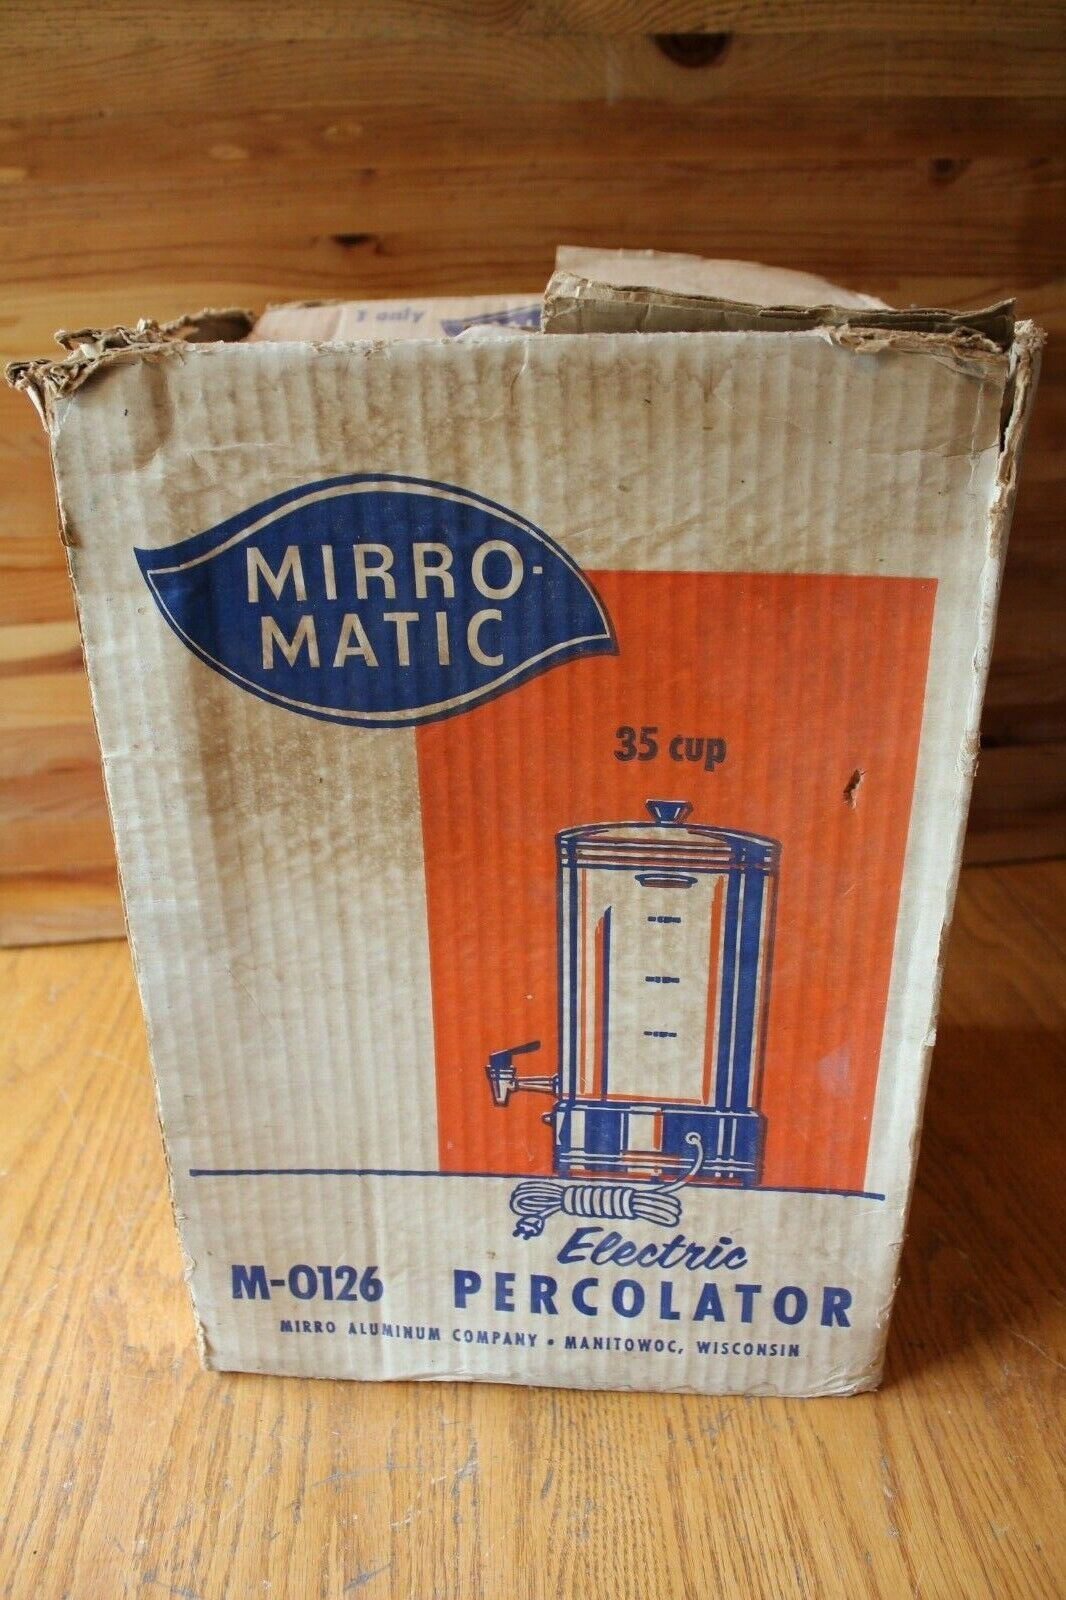 Mirro Matic Coffee Percolator Urn Model M-0126 35 Cup Electric NO POWERCORD